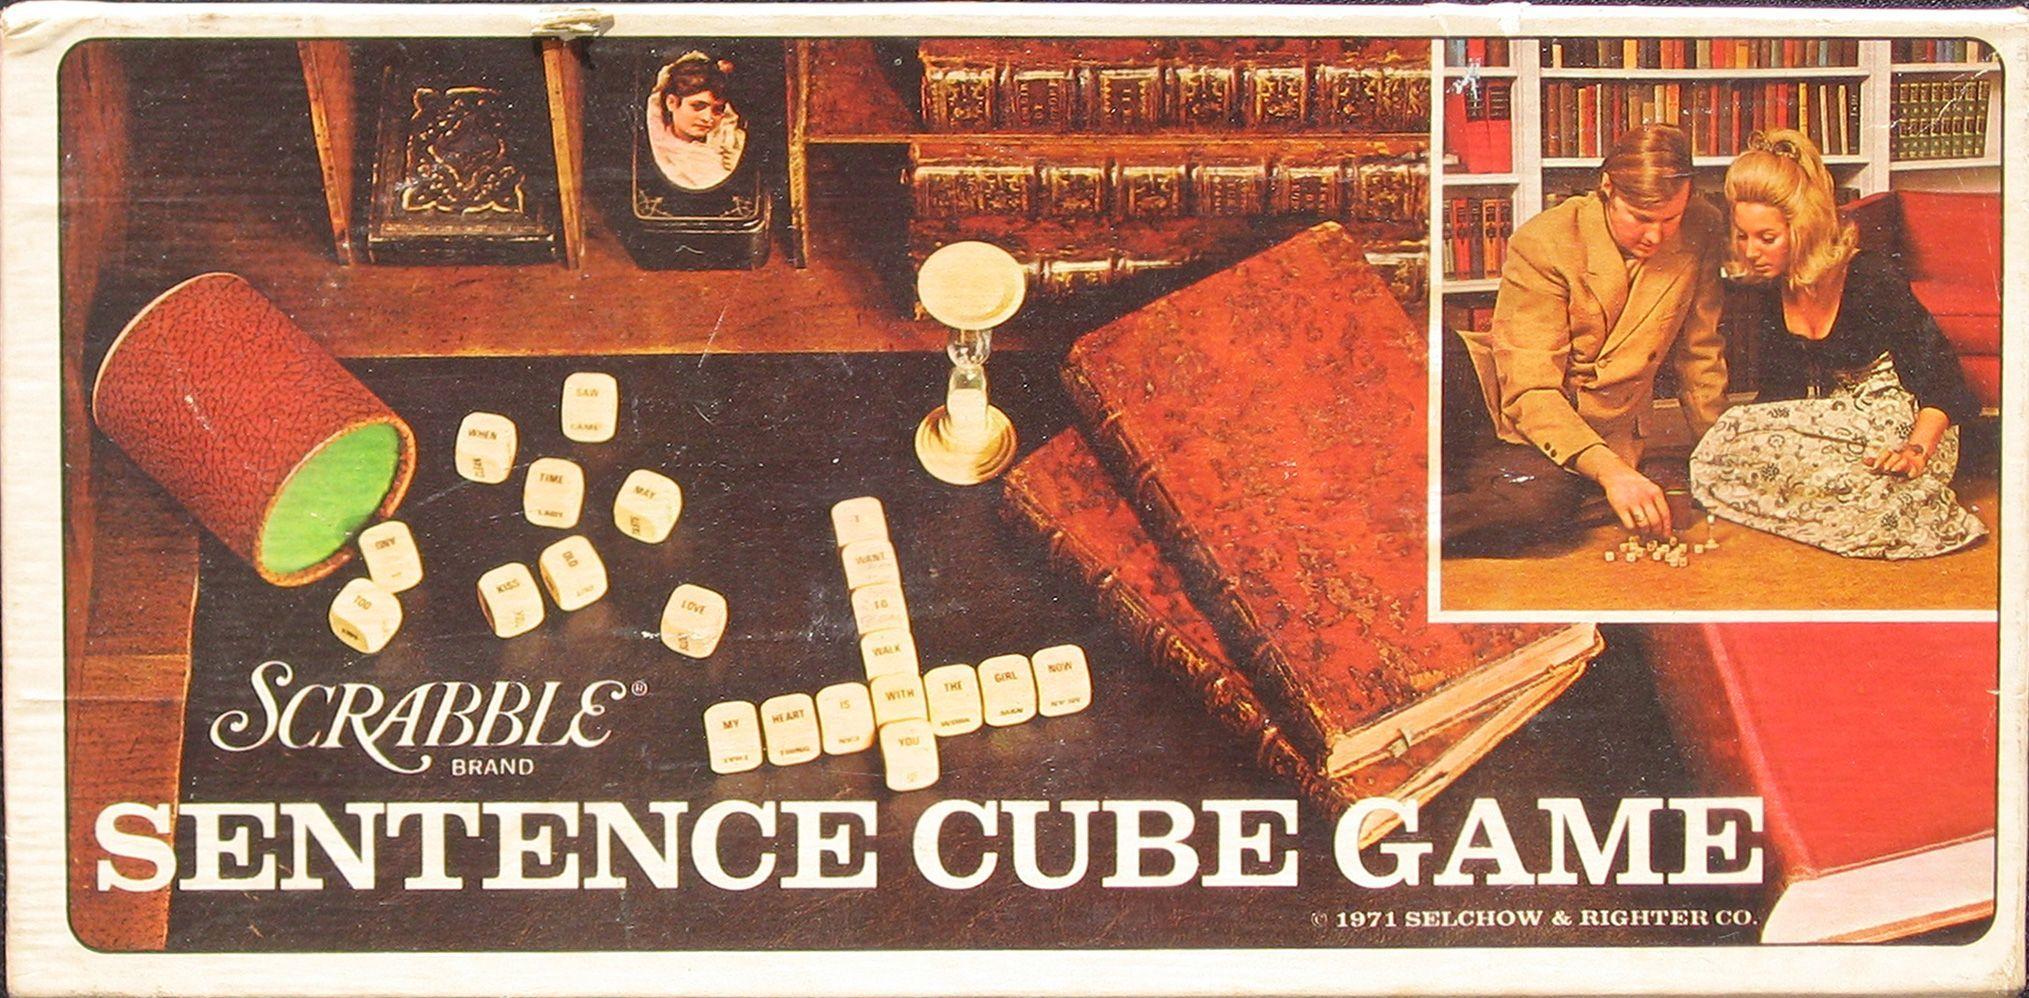 Scrabble Sentence Cube Game